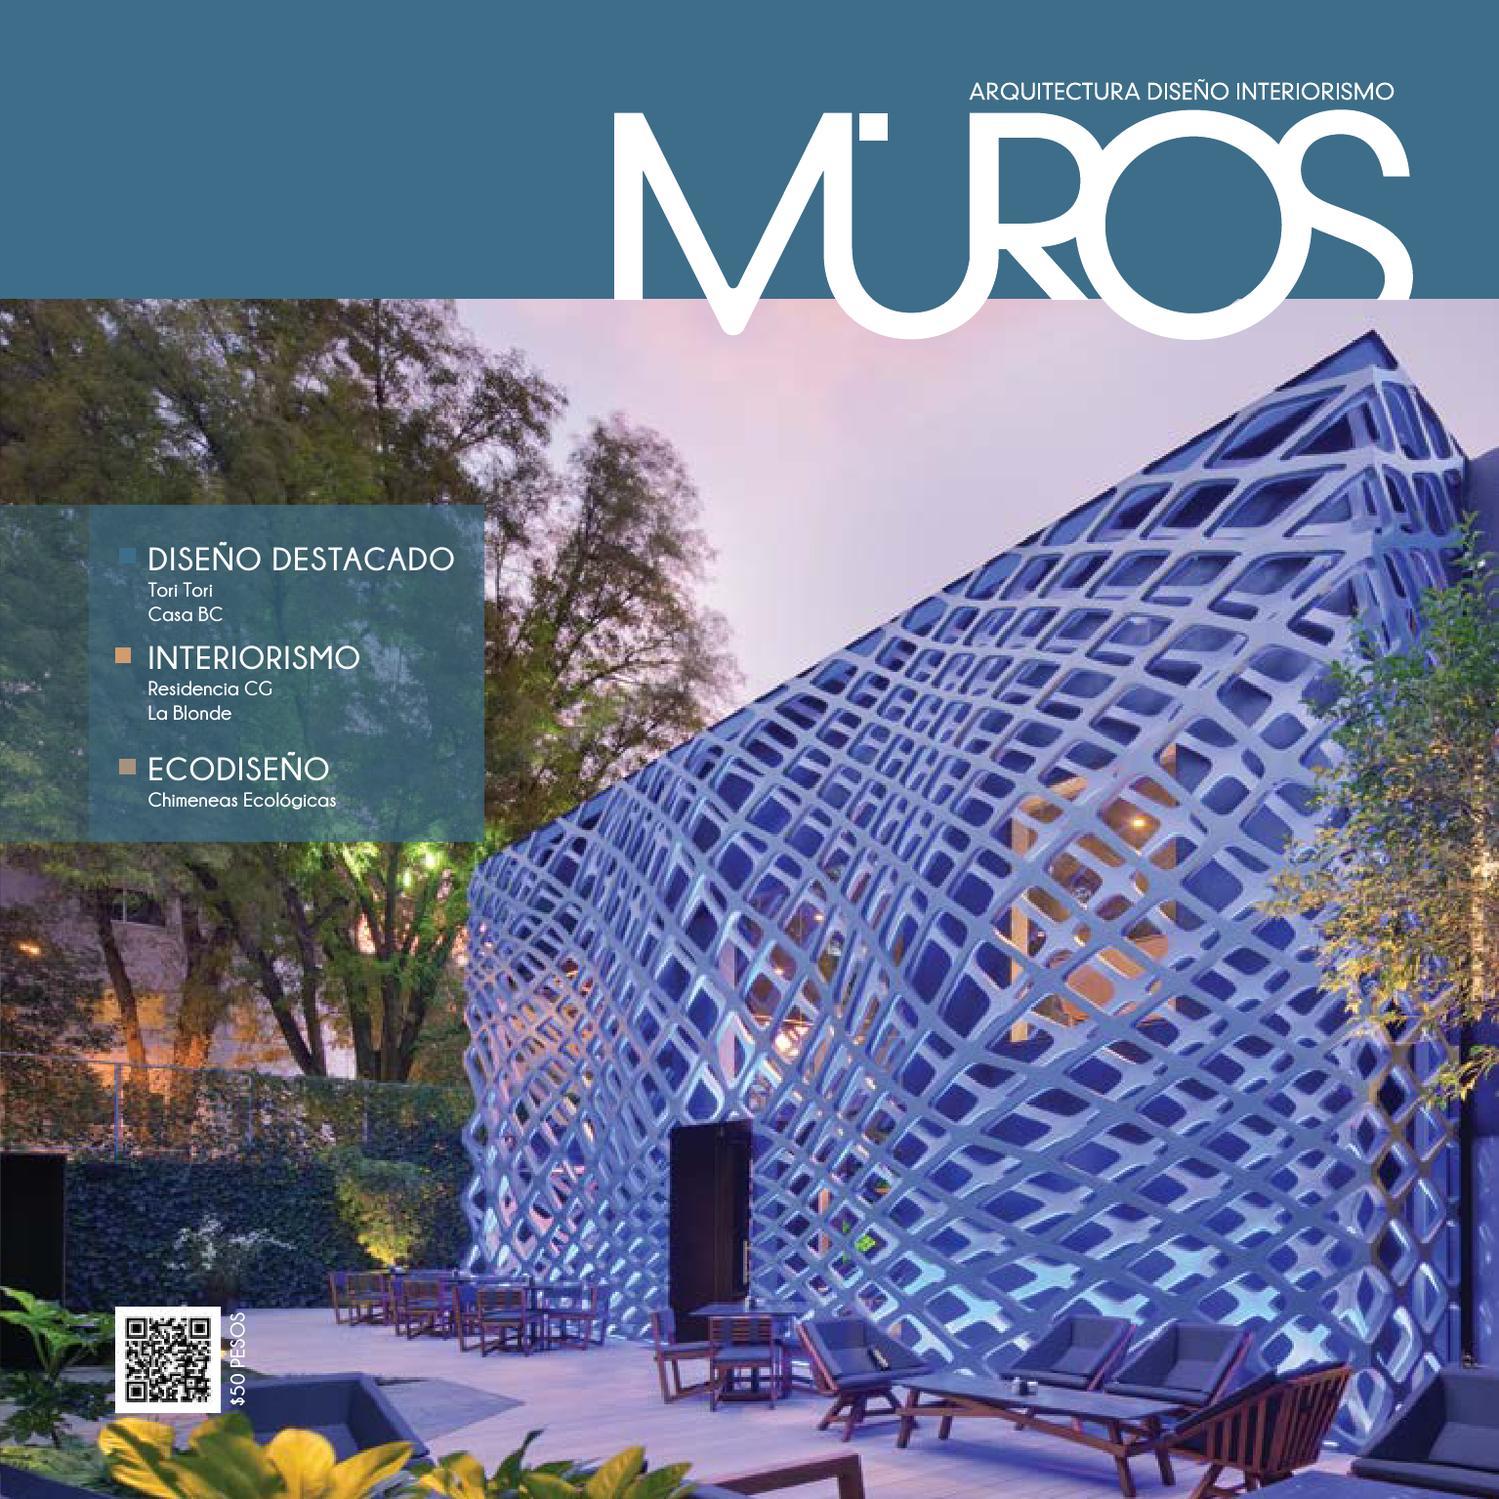 Edici n 2 revista muros arquitectura dise o interiorismo for Revista habitat arquitectura diseno interiorismo